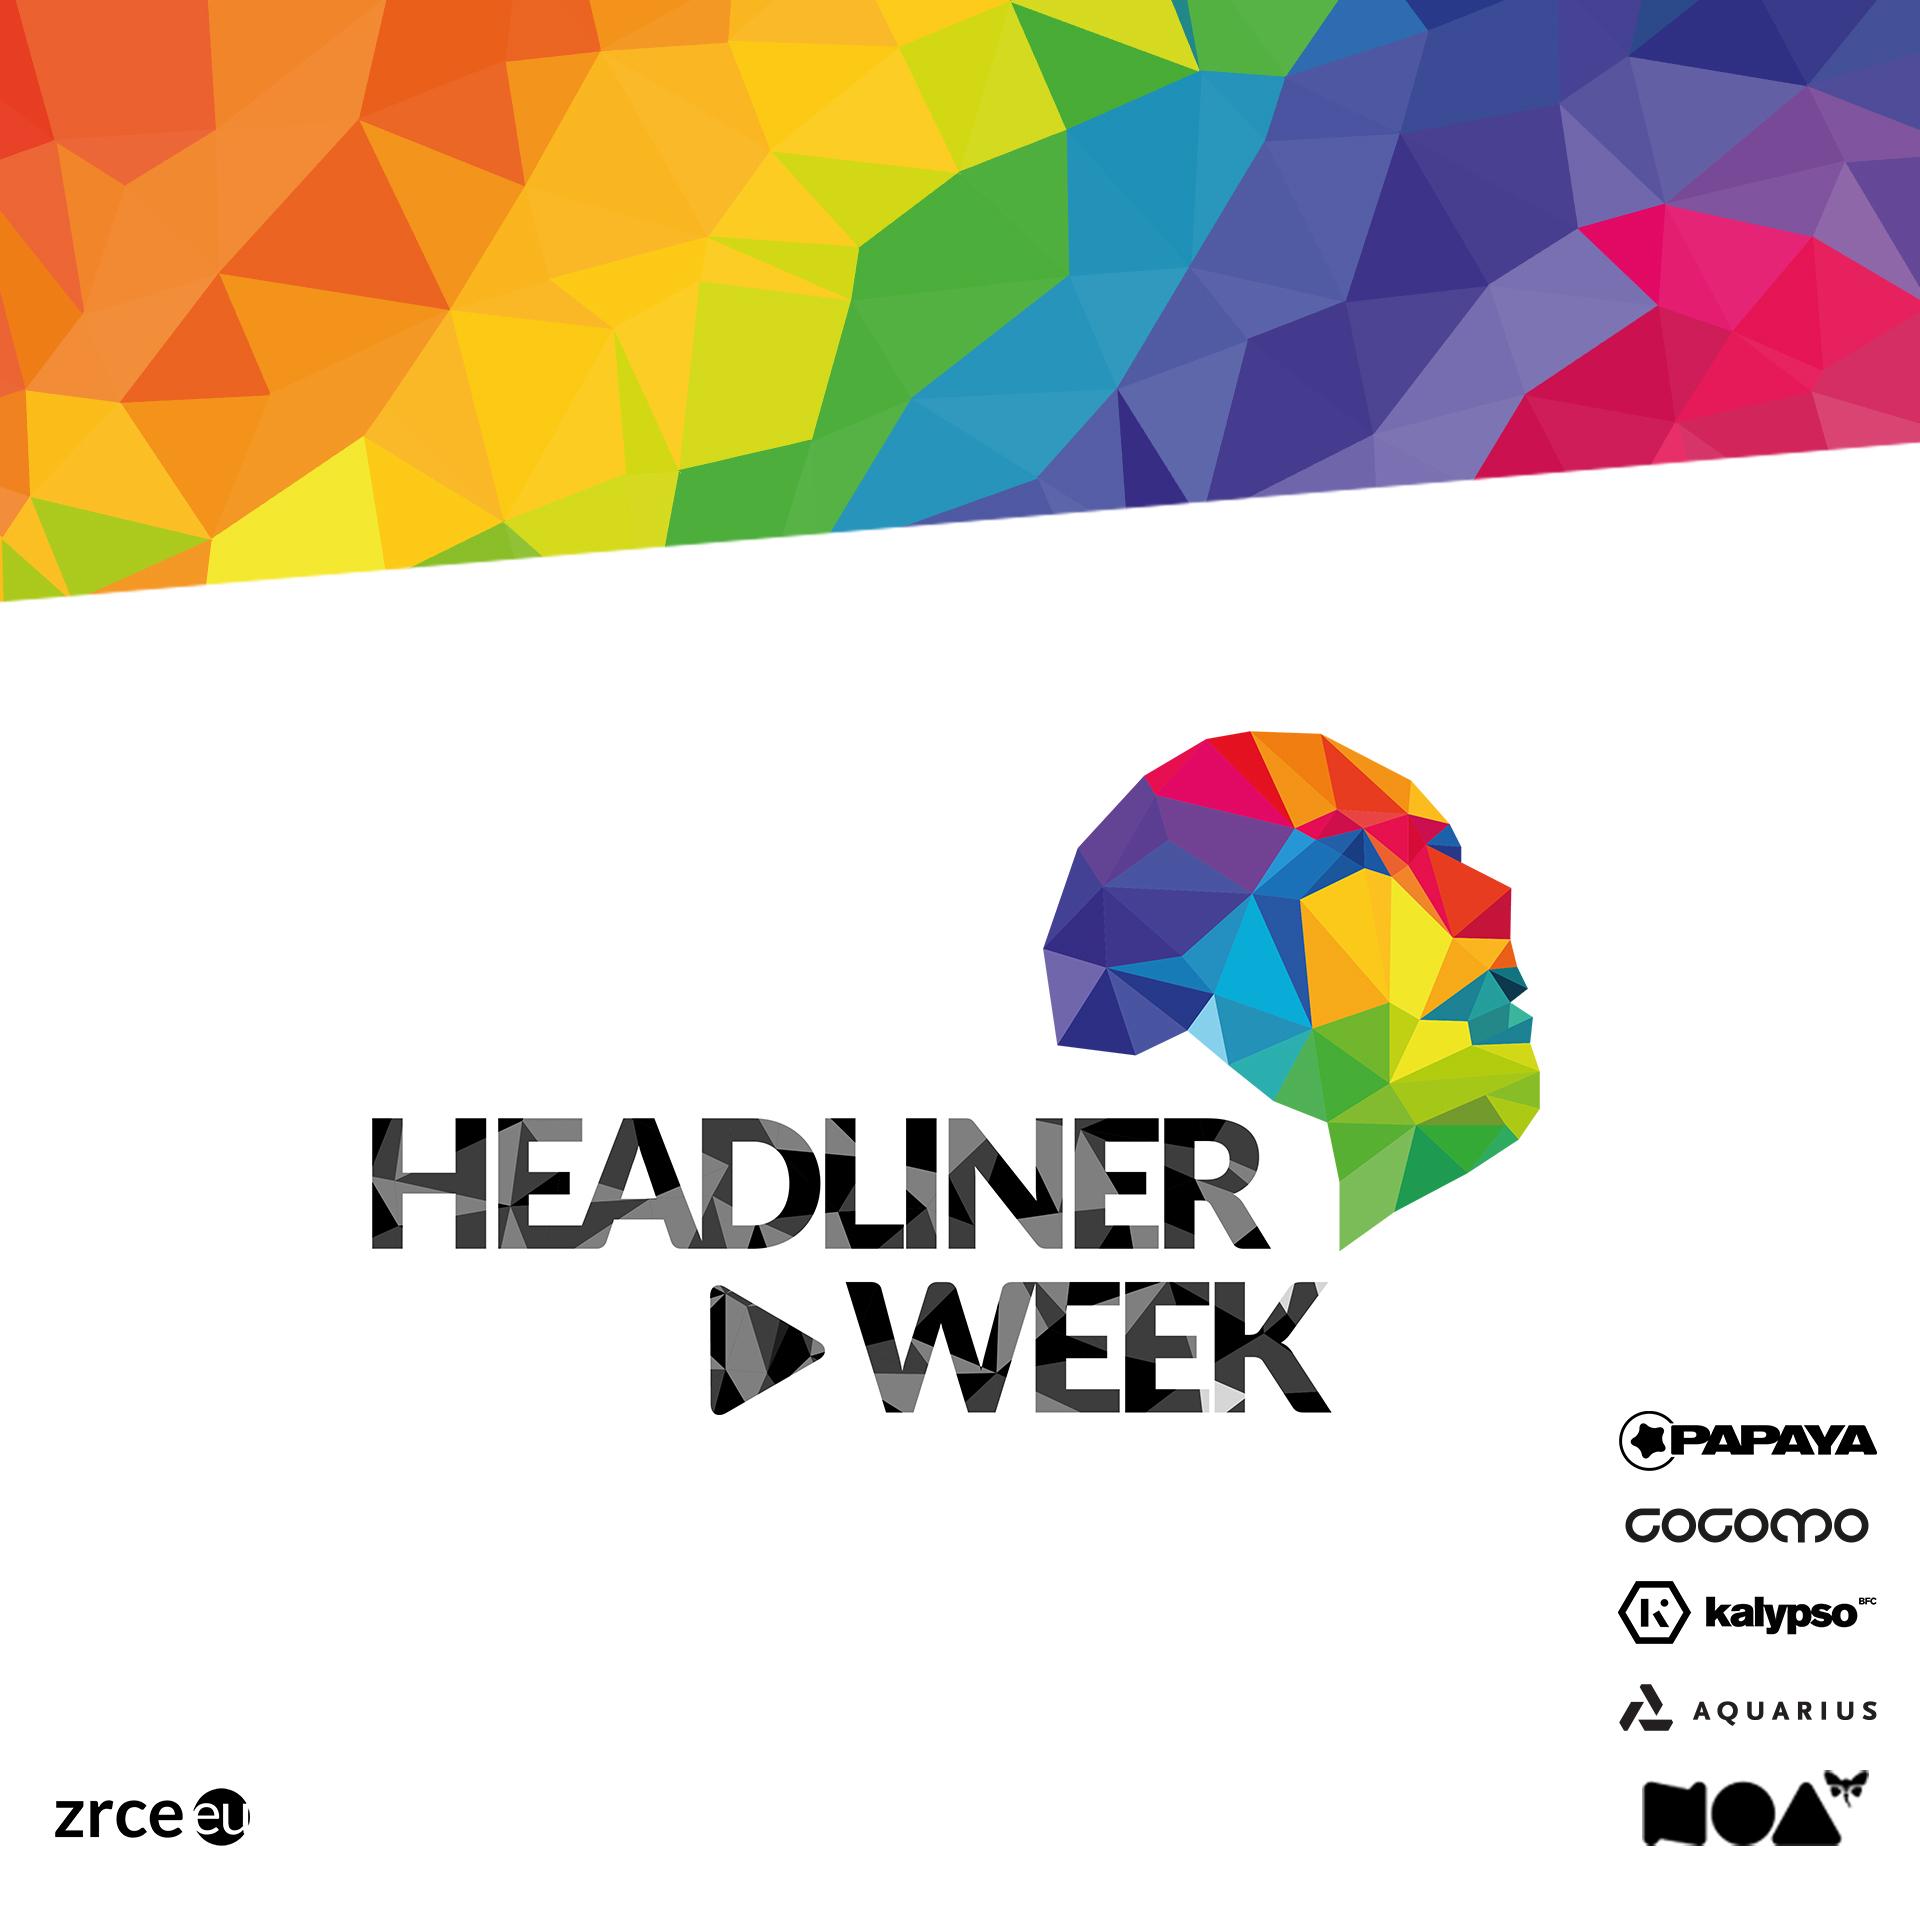 Headliner Week at Zrce Beach